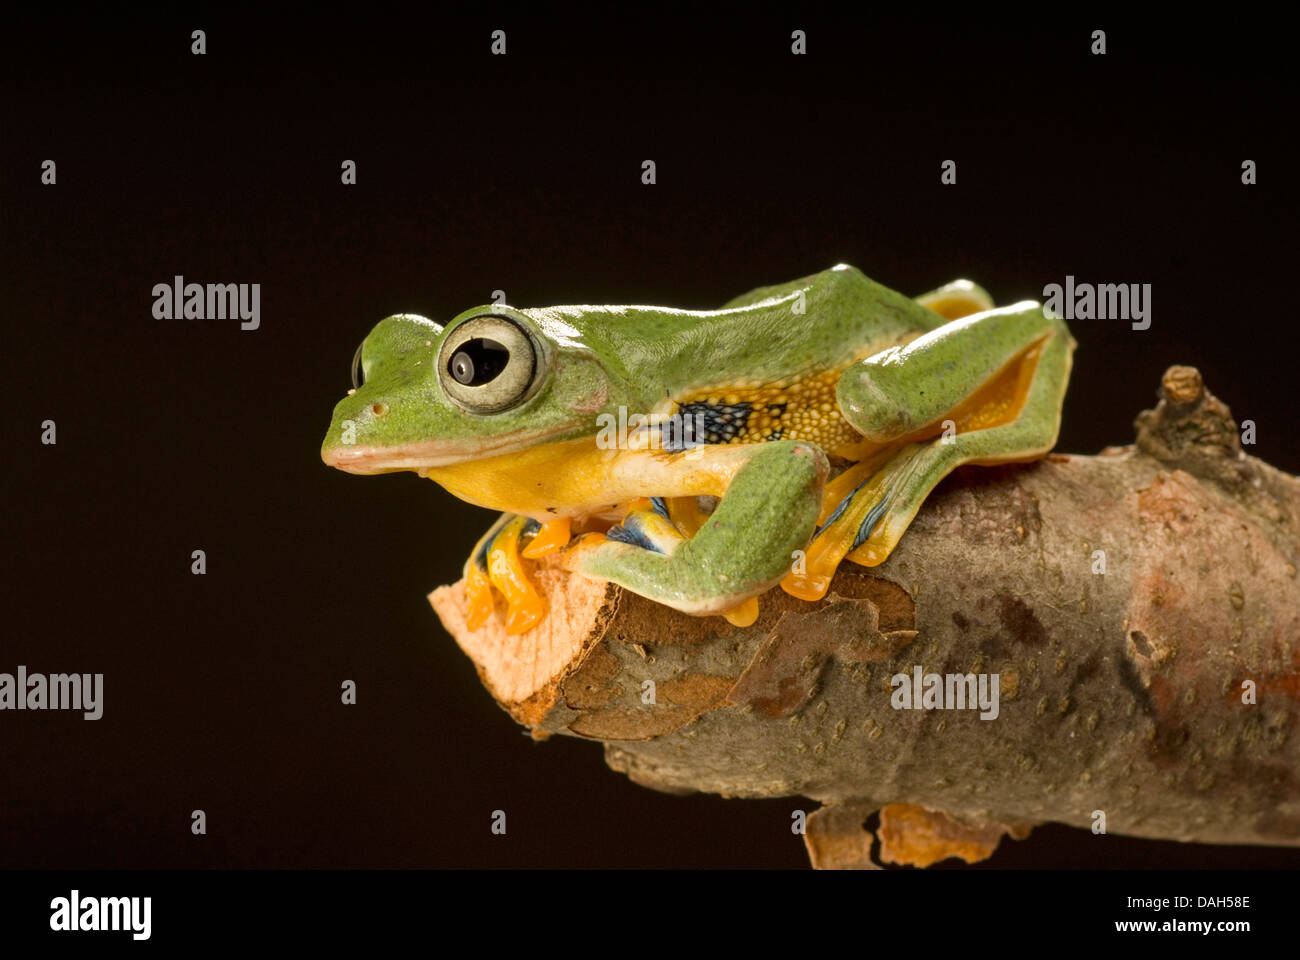 Java Flying Frog (Rhacophorus reinwardtii), on a branch - Stock Image